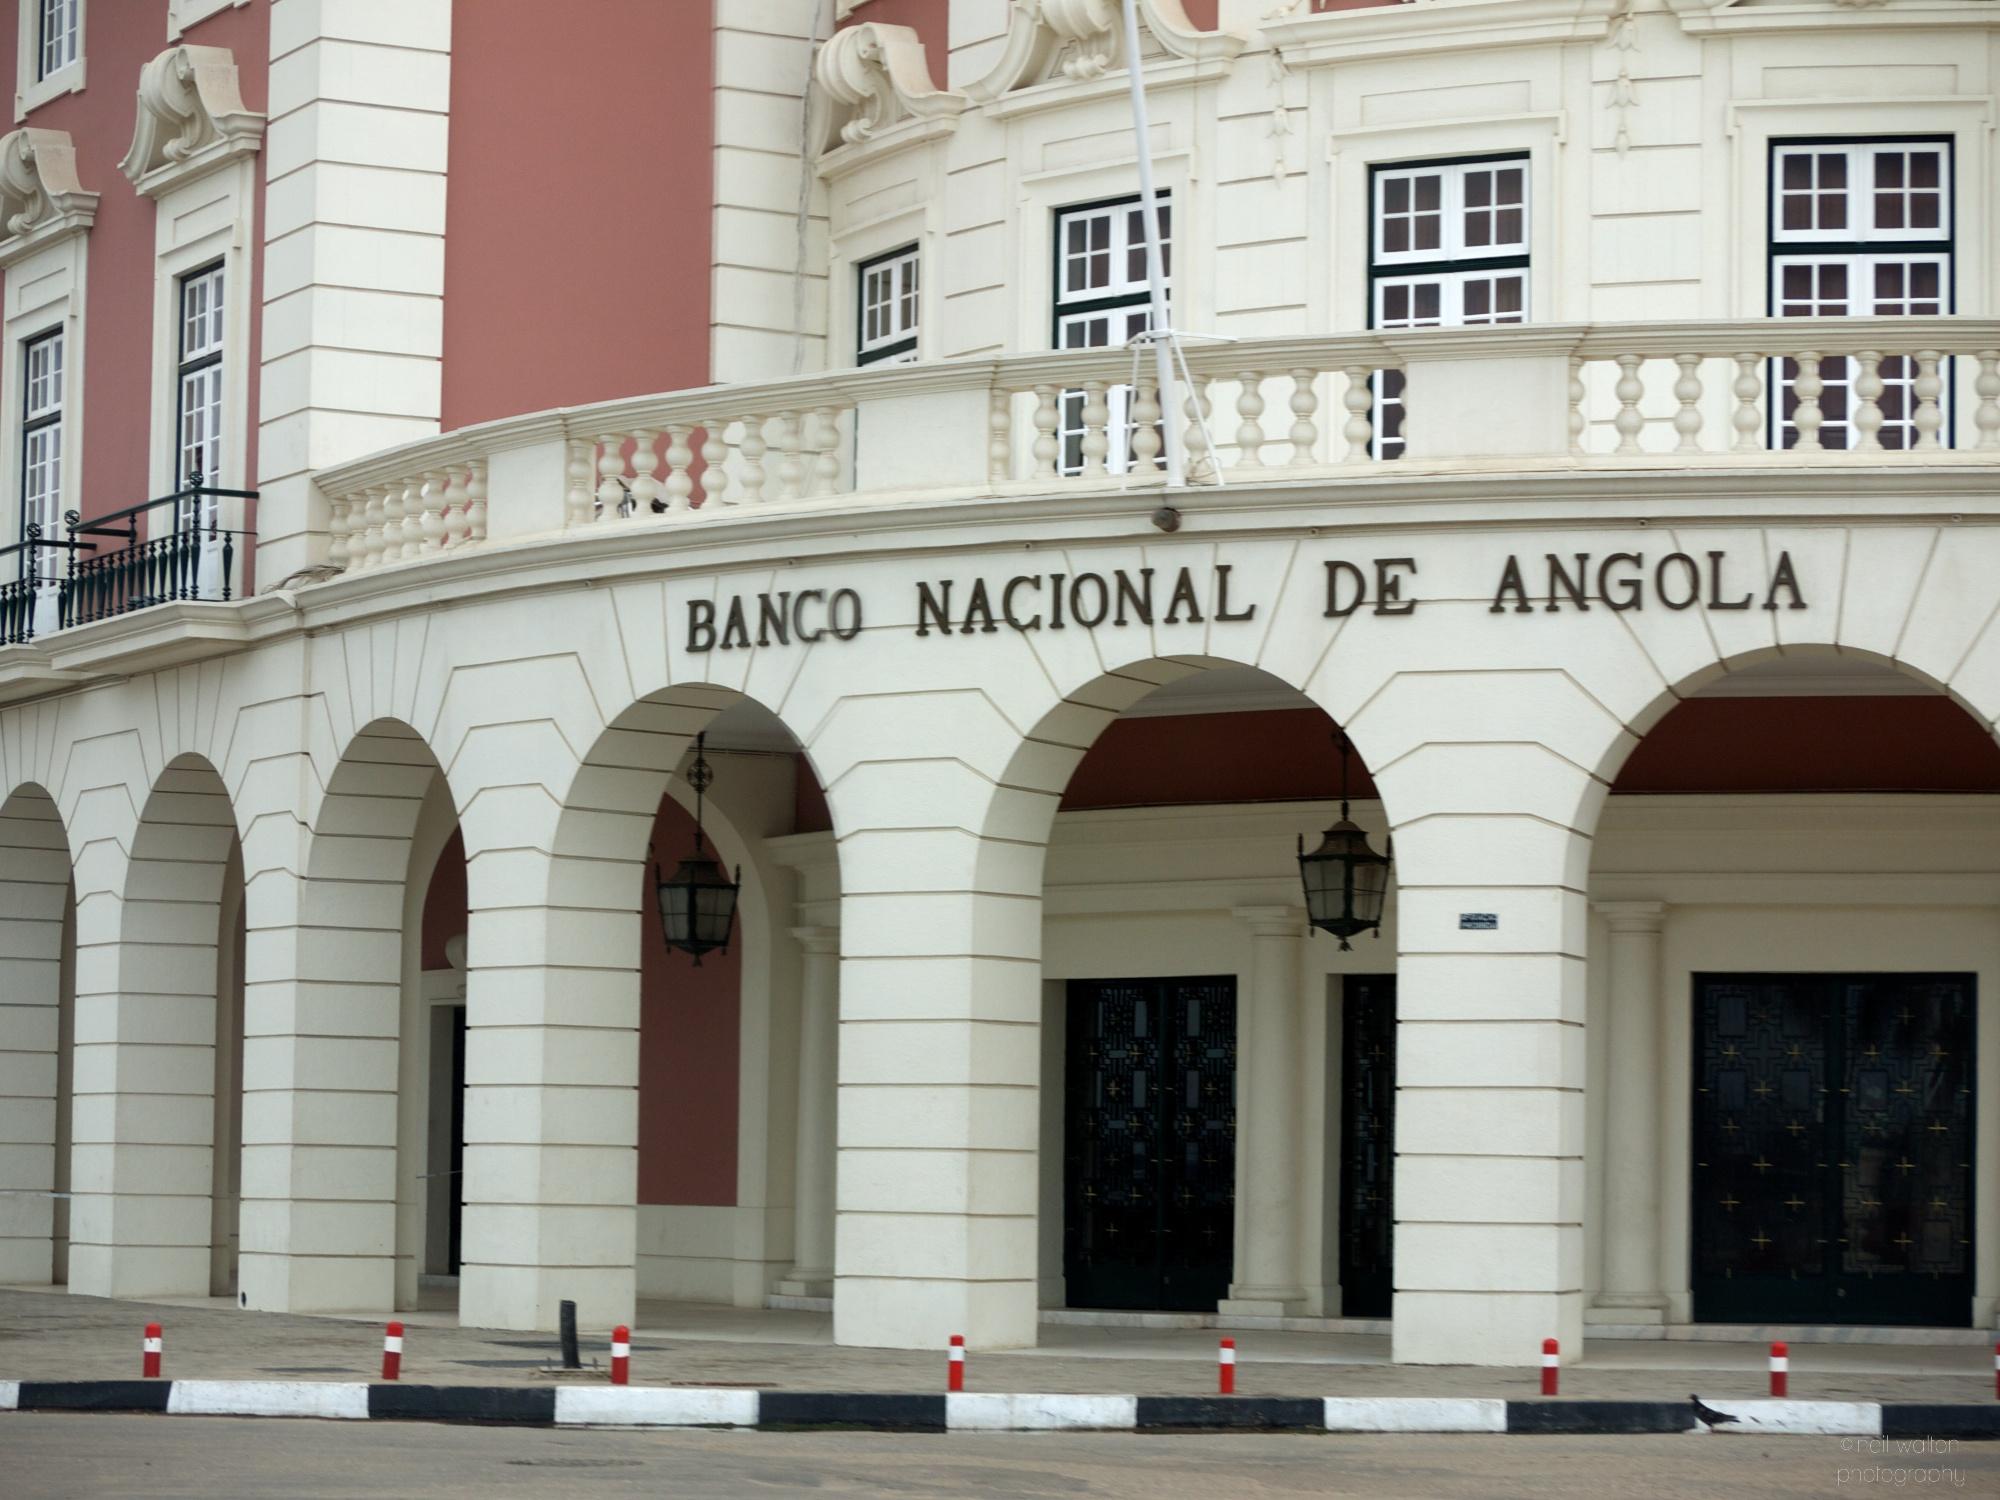 Angola coloca 40 milhões de euros no mercado e kwanza continua a depreciar-se